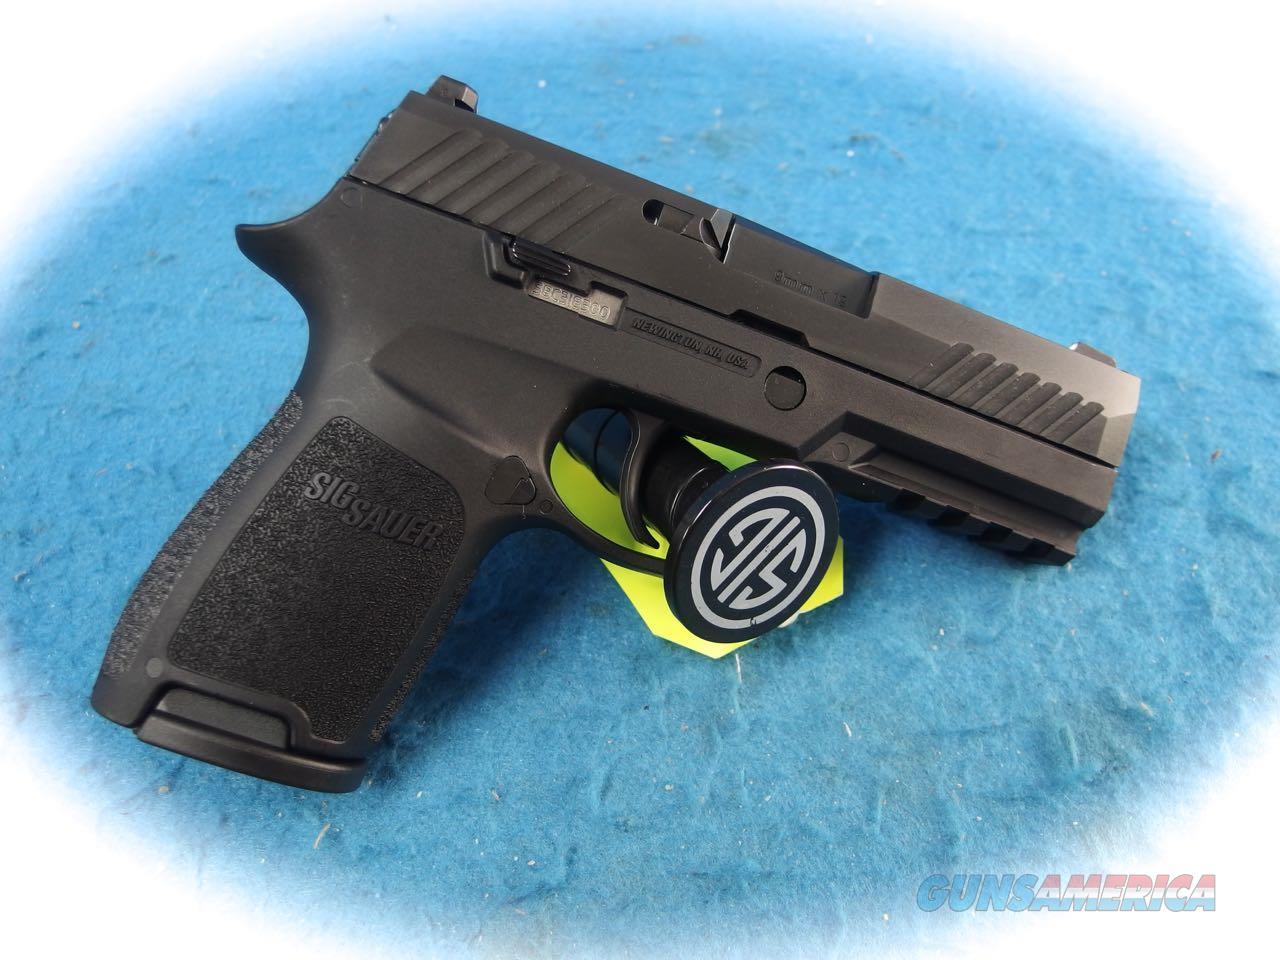 Sig Sauer P320C Nitron Compact 9mm Pistol Model 320C-9-B **New**  Guns > Pistols > Sig - Sauer/Sigarms Pistols > P320